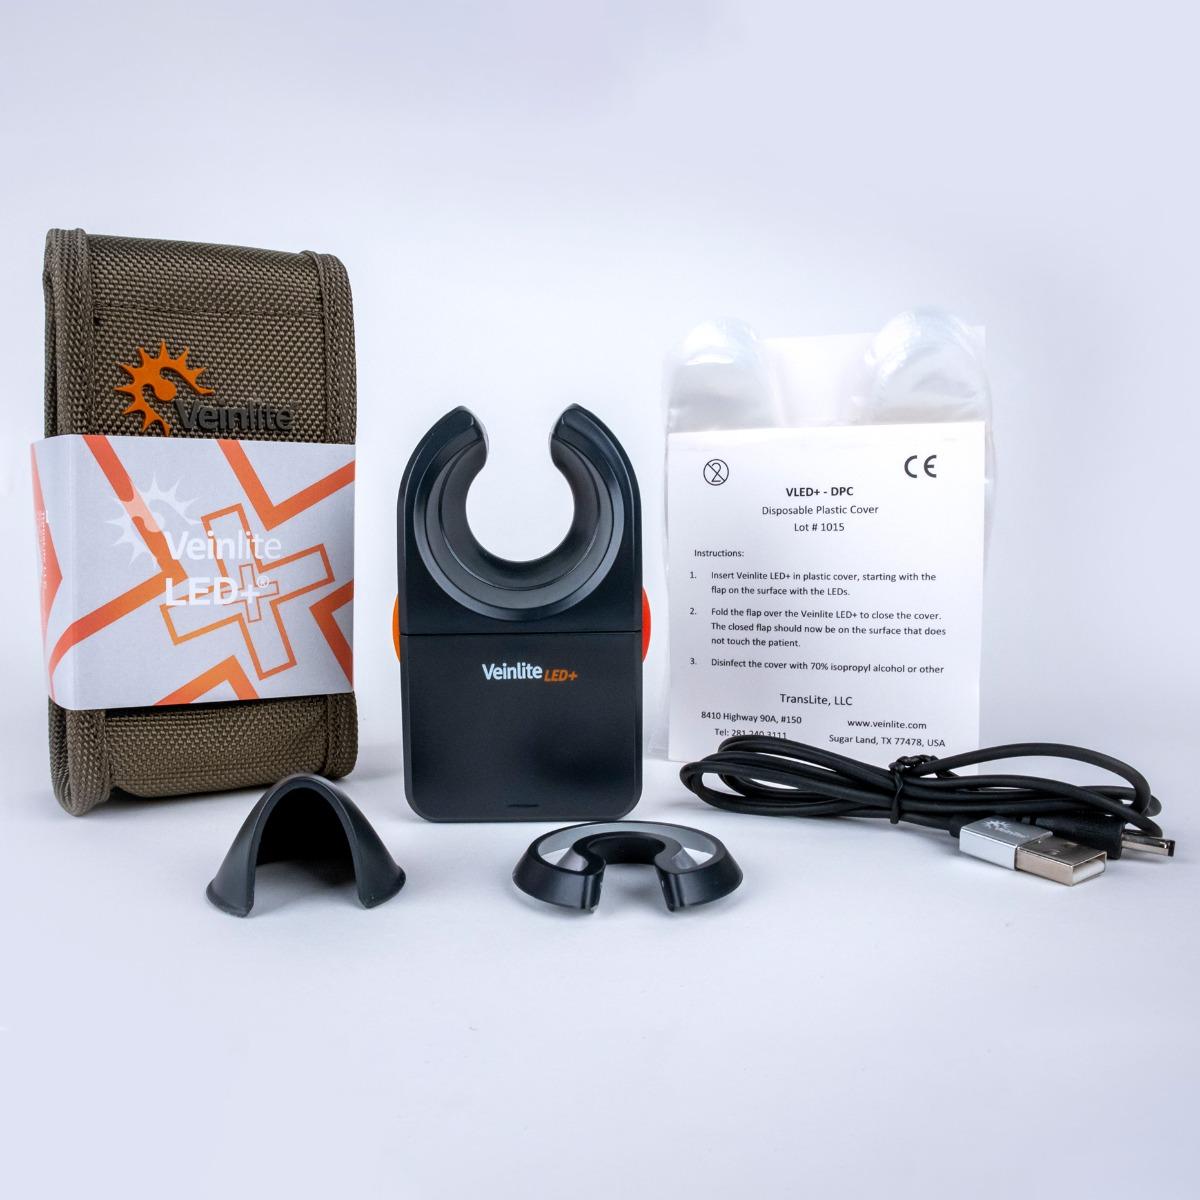 Contents of Veinlite LED+ Kit